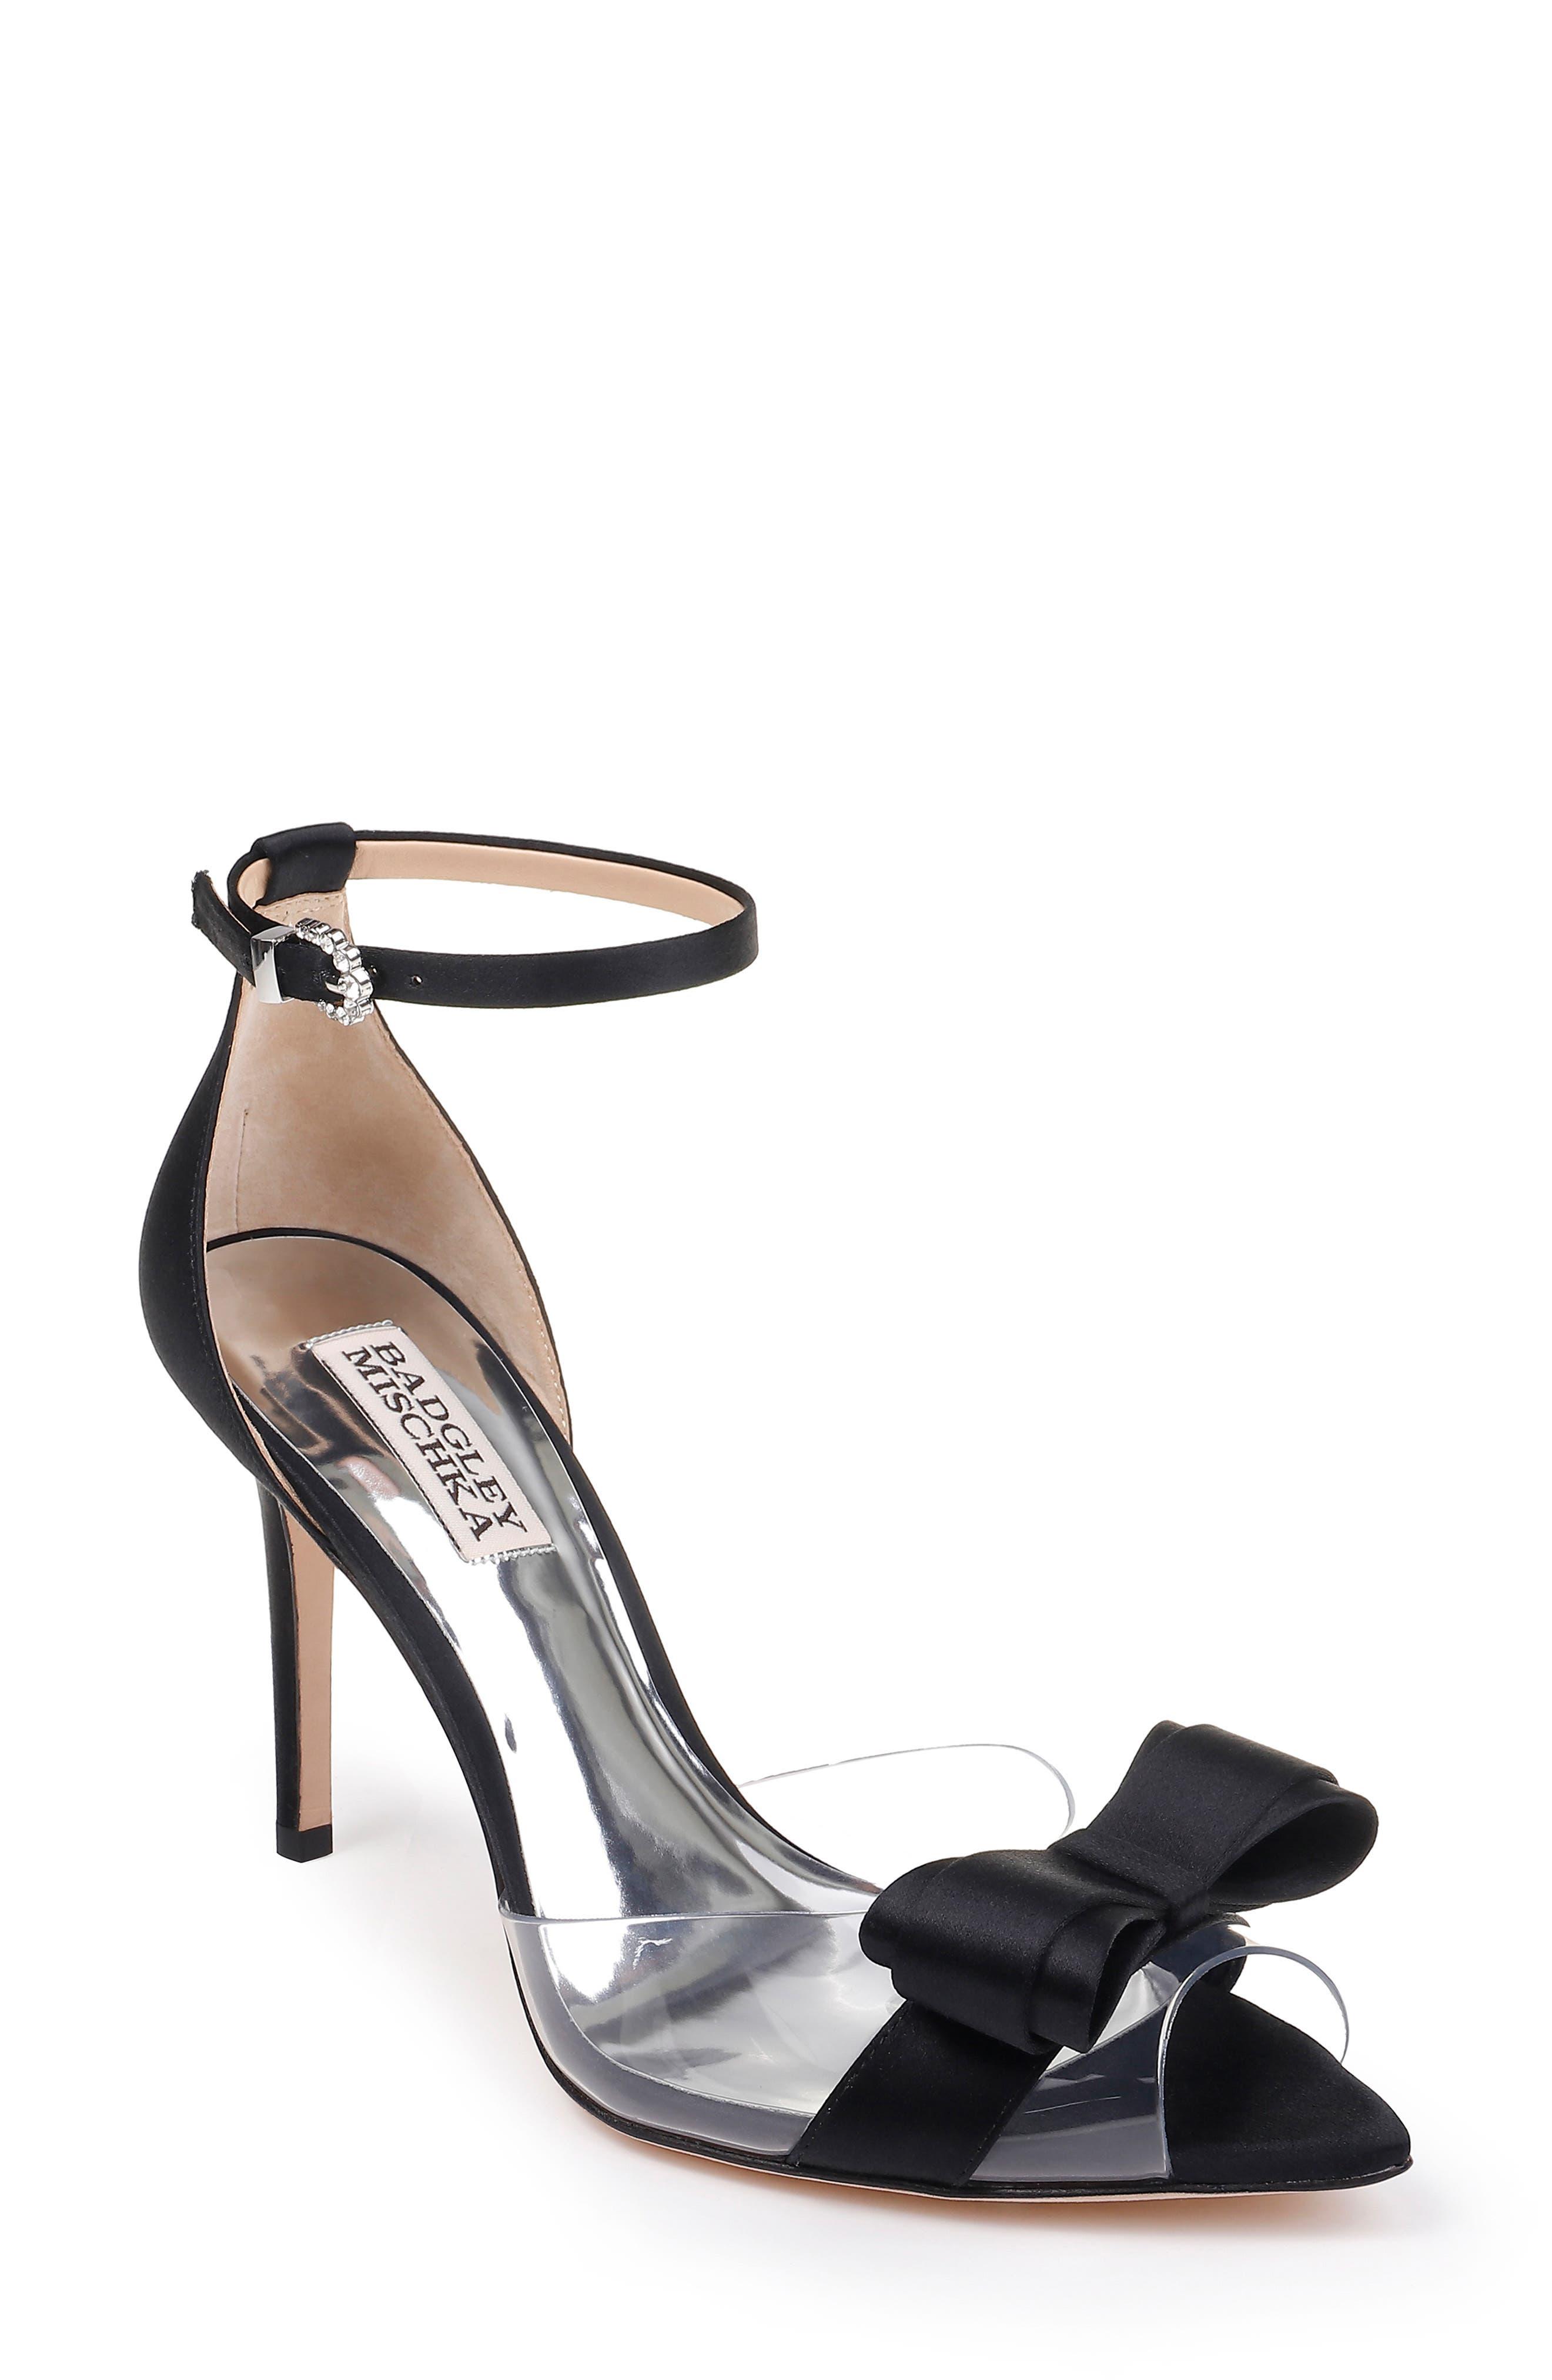 BADGLEY MISCHKA COLLECTION,                             Badgley Mischka Lindsay Ankle Strap Sandal,                             Main thumbnail 1, color,                             BLACK SATIN